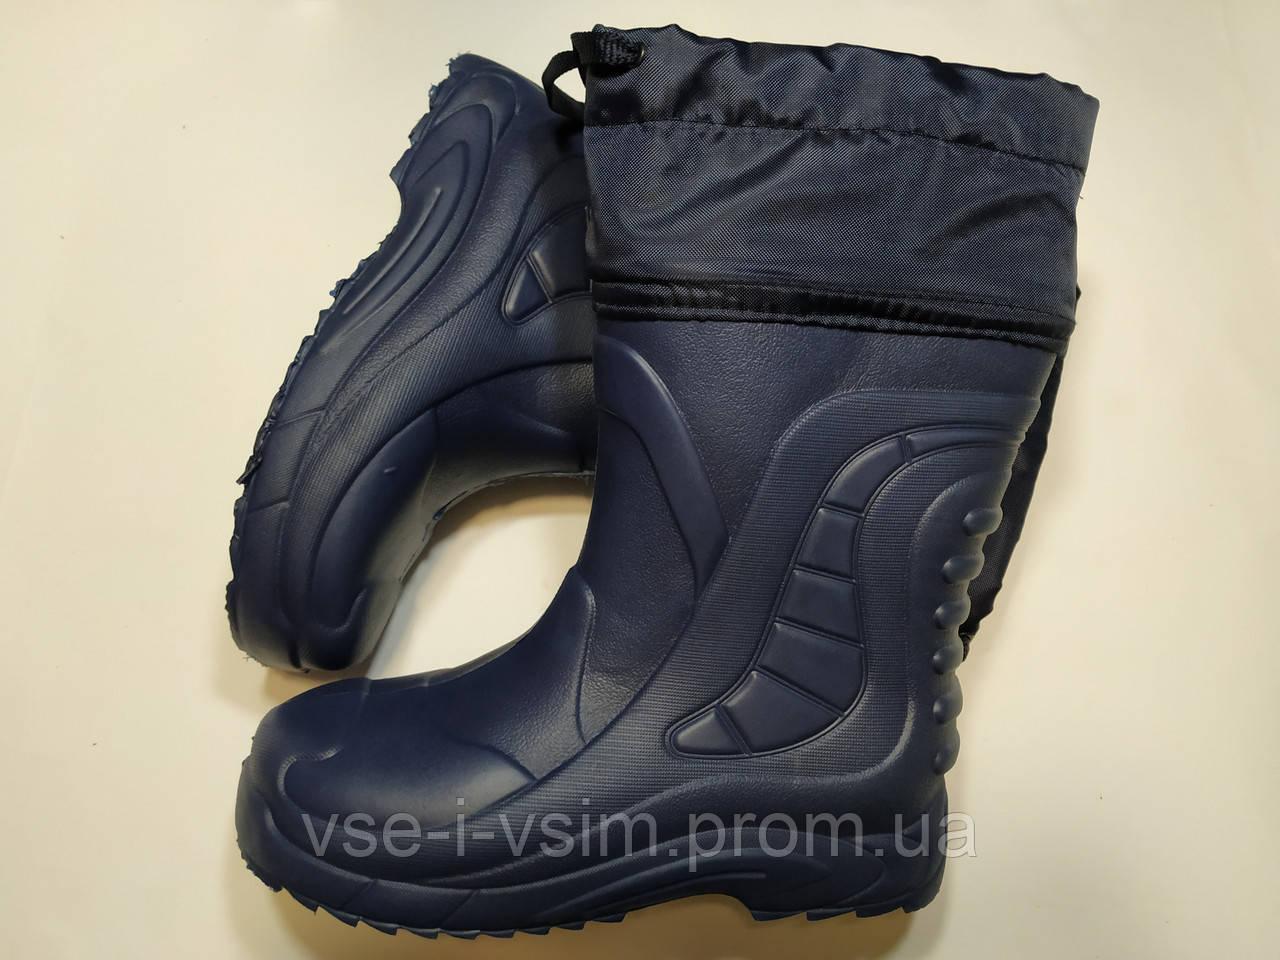 Сапоги теплые легкие EVA 40 р 25 см